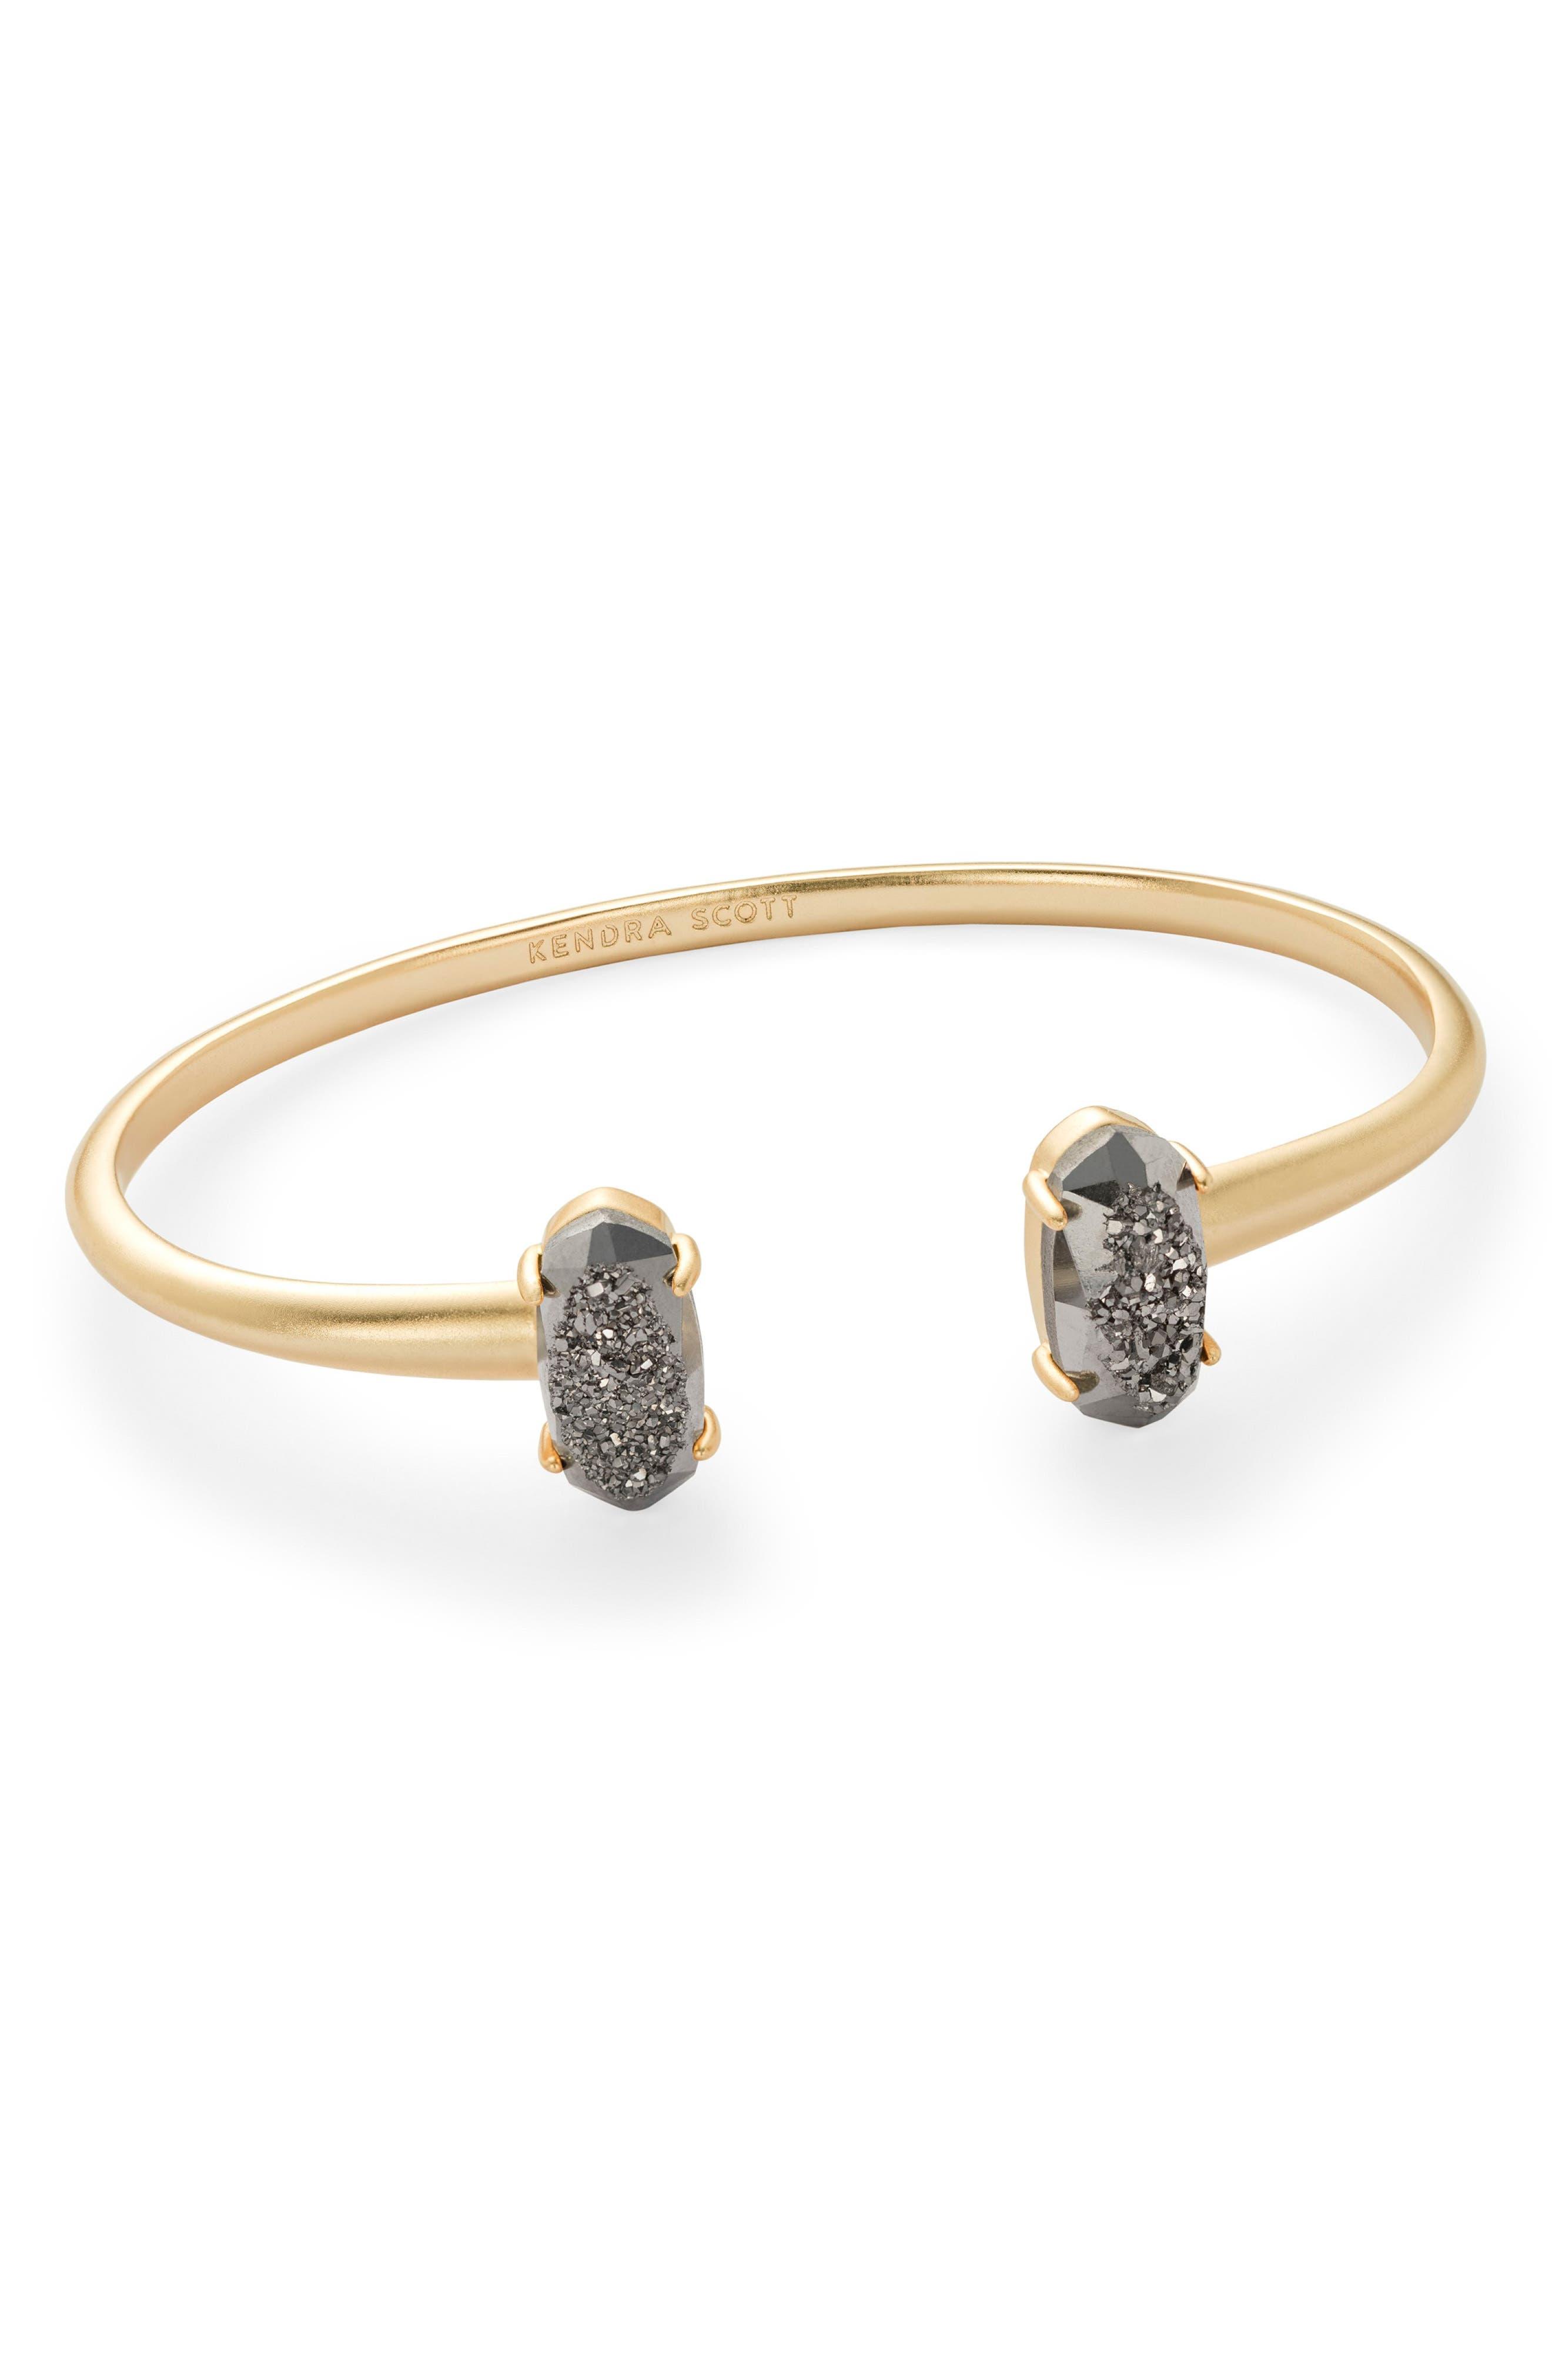 1e7763fa1a9 Women's Bracelets | Nordstrom